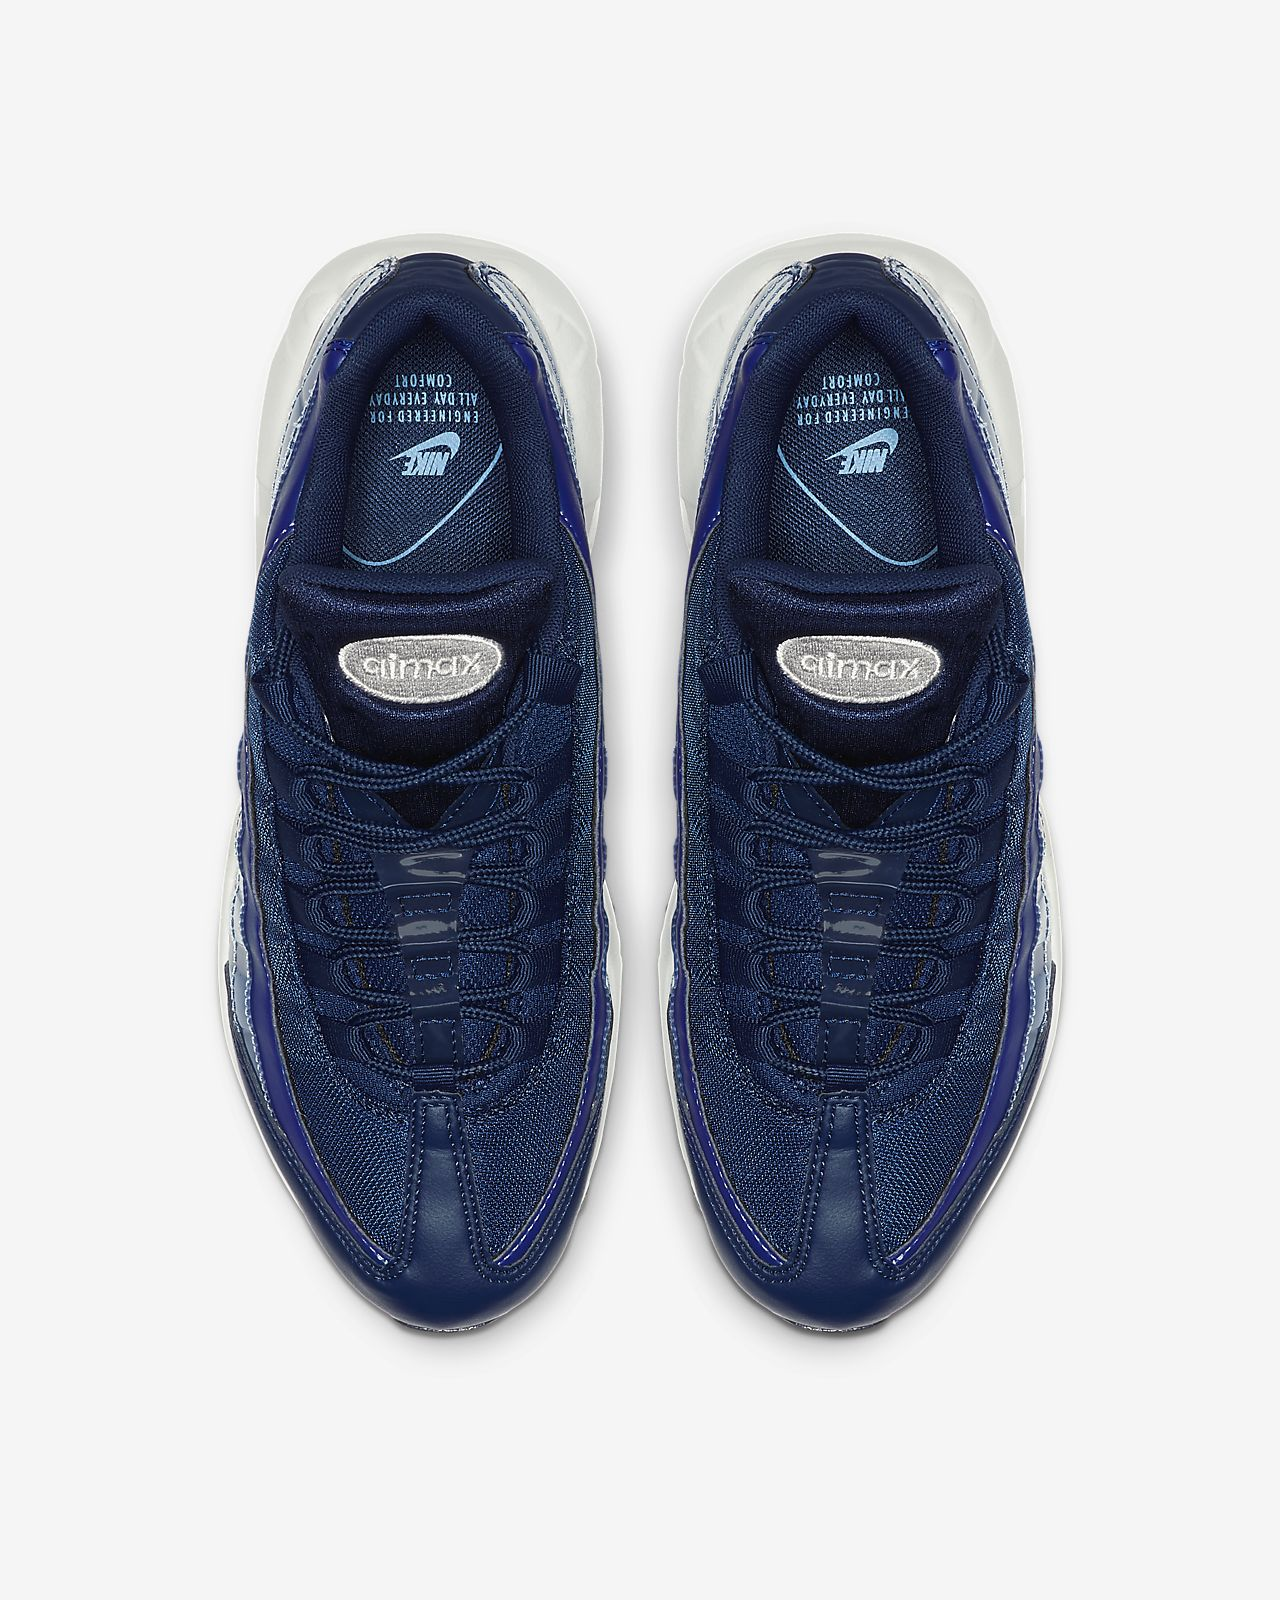 16c81755d8e4af Nike Air Max 95 SE Women s Shoe. Nike.com RO